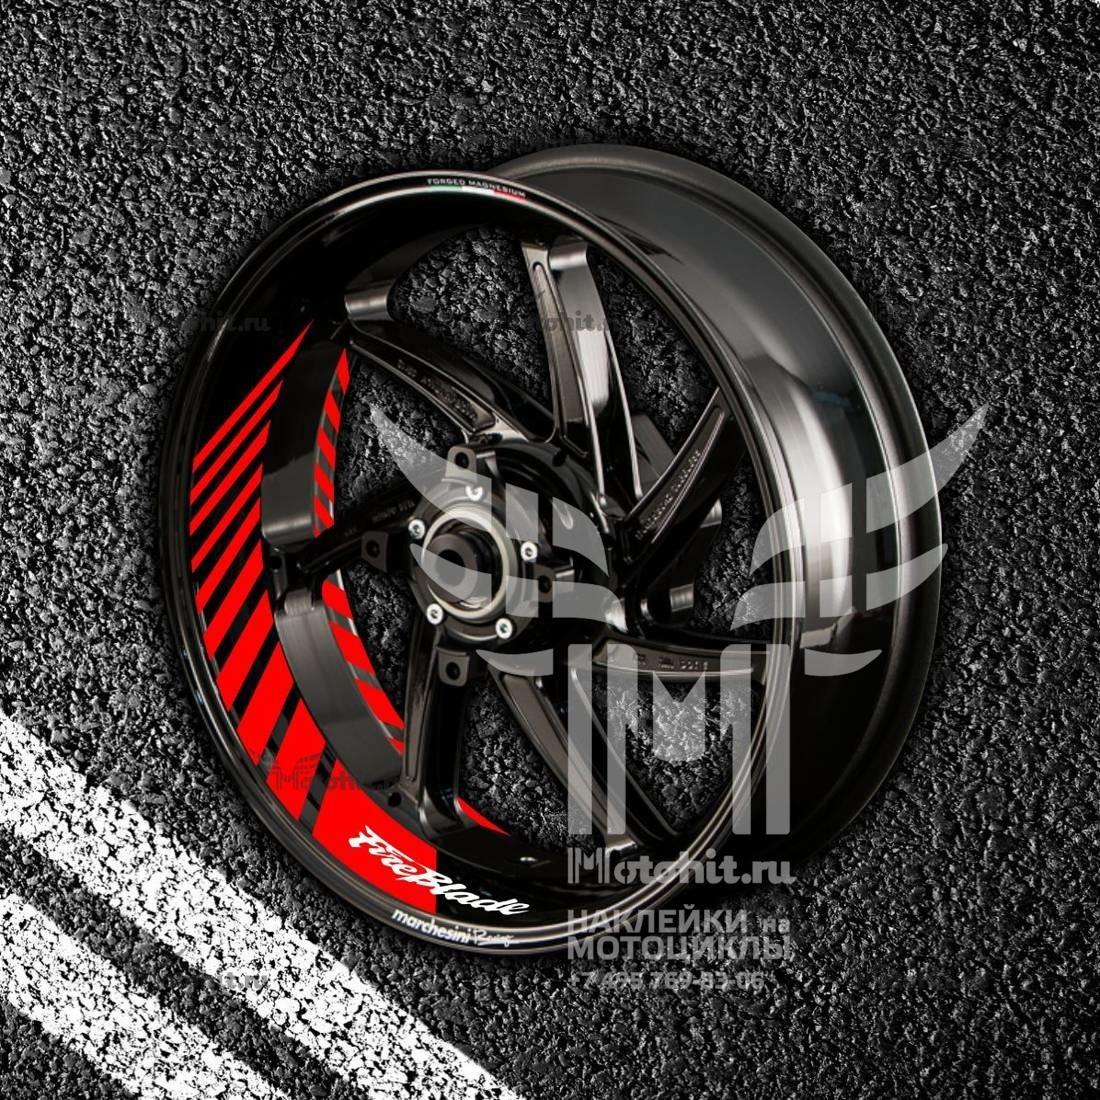 Комплект наклеек с полосами на колеса мотоцикла HONDA FIREBLADE